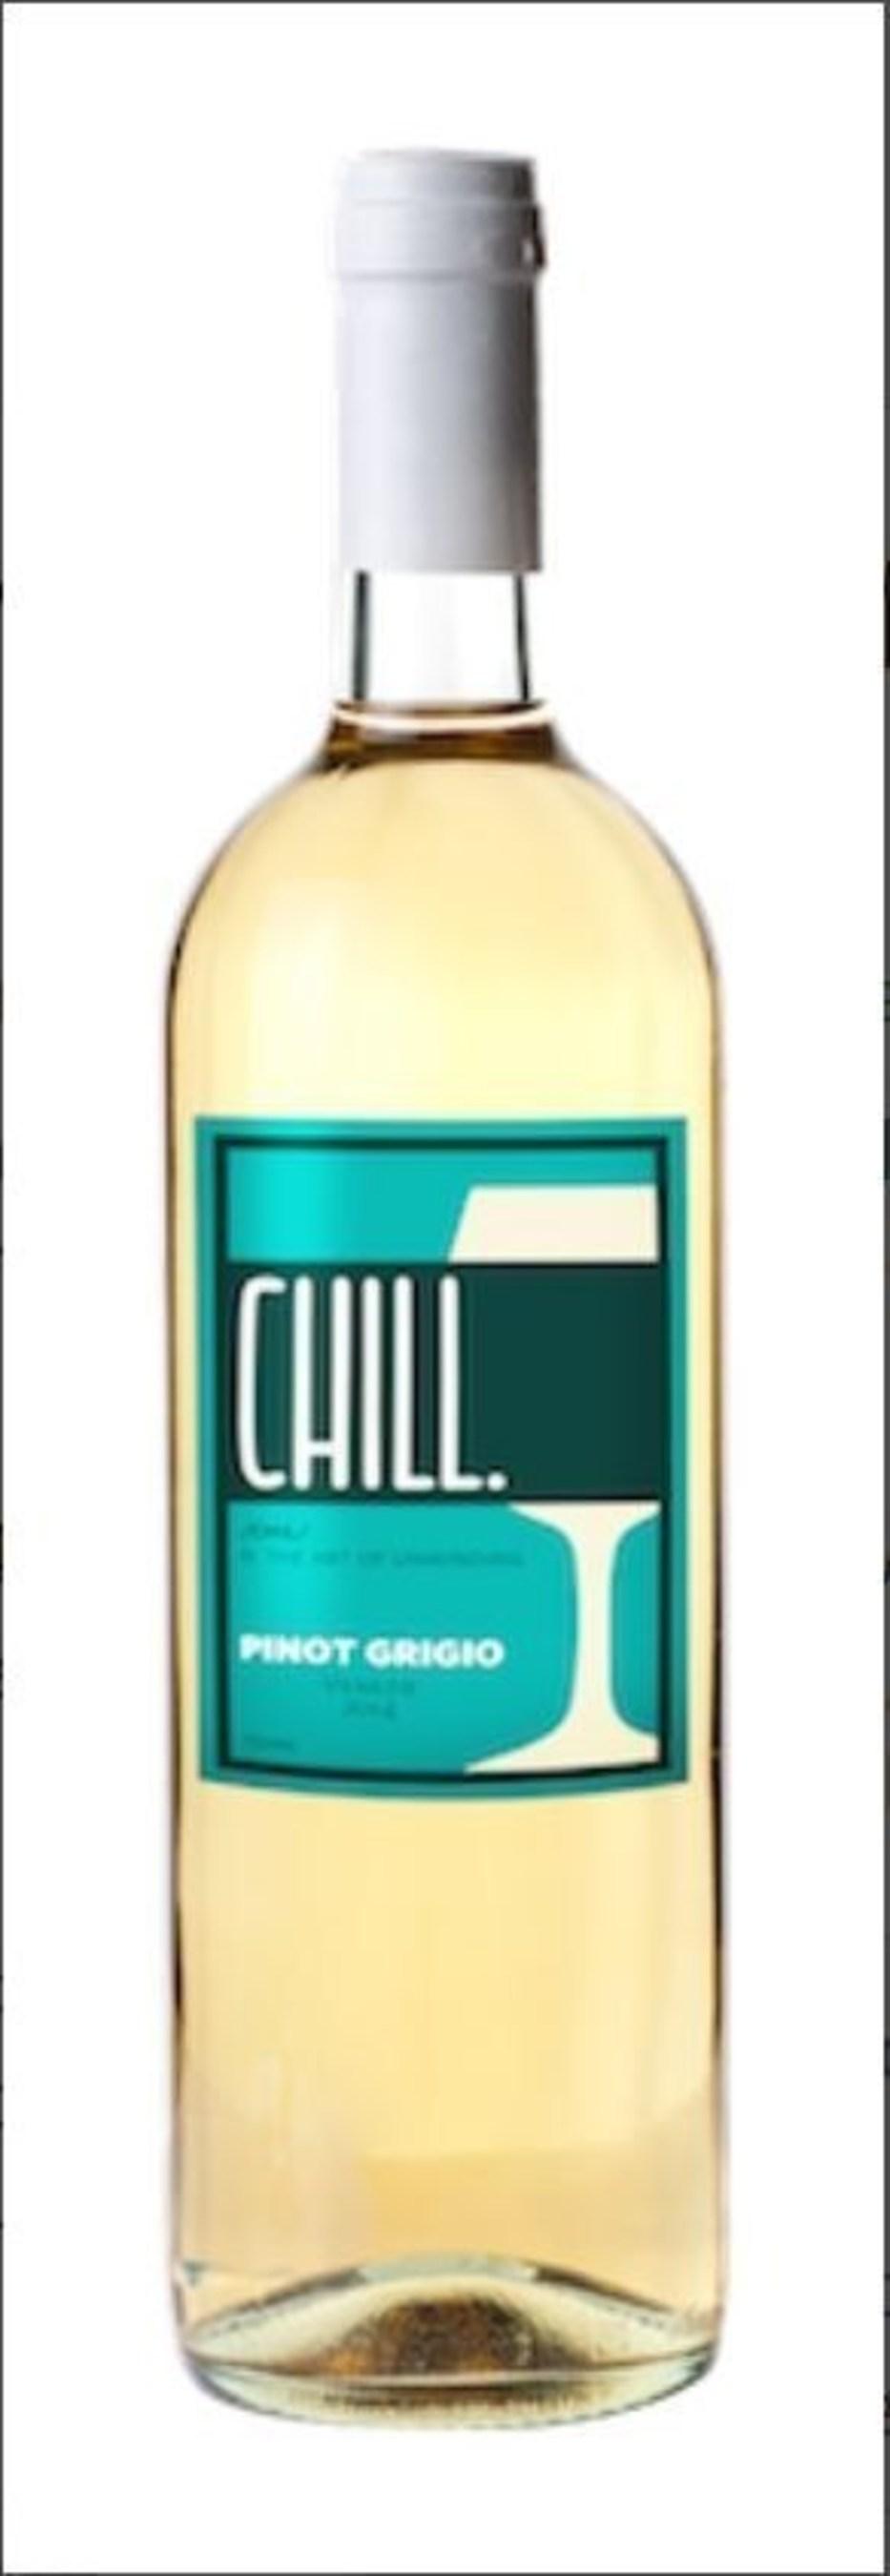 'Chill.' New Wine Highlights the Art of Unwinding